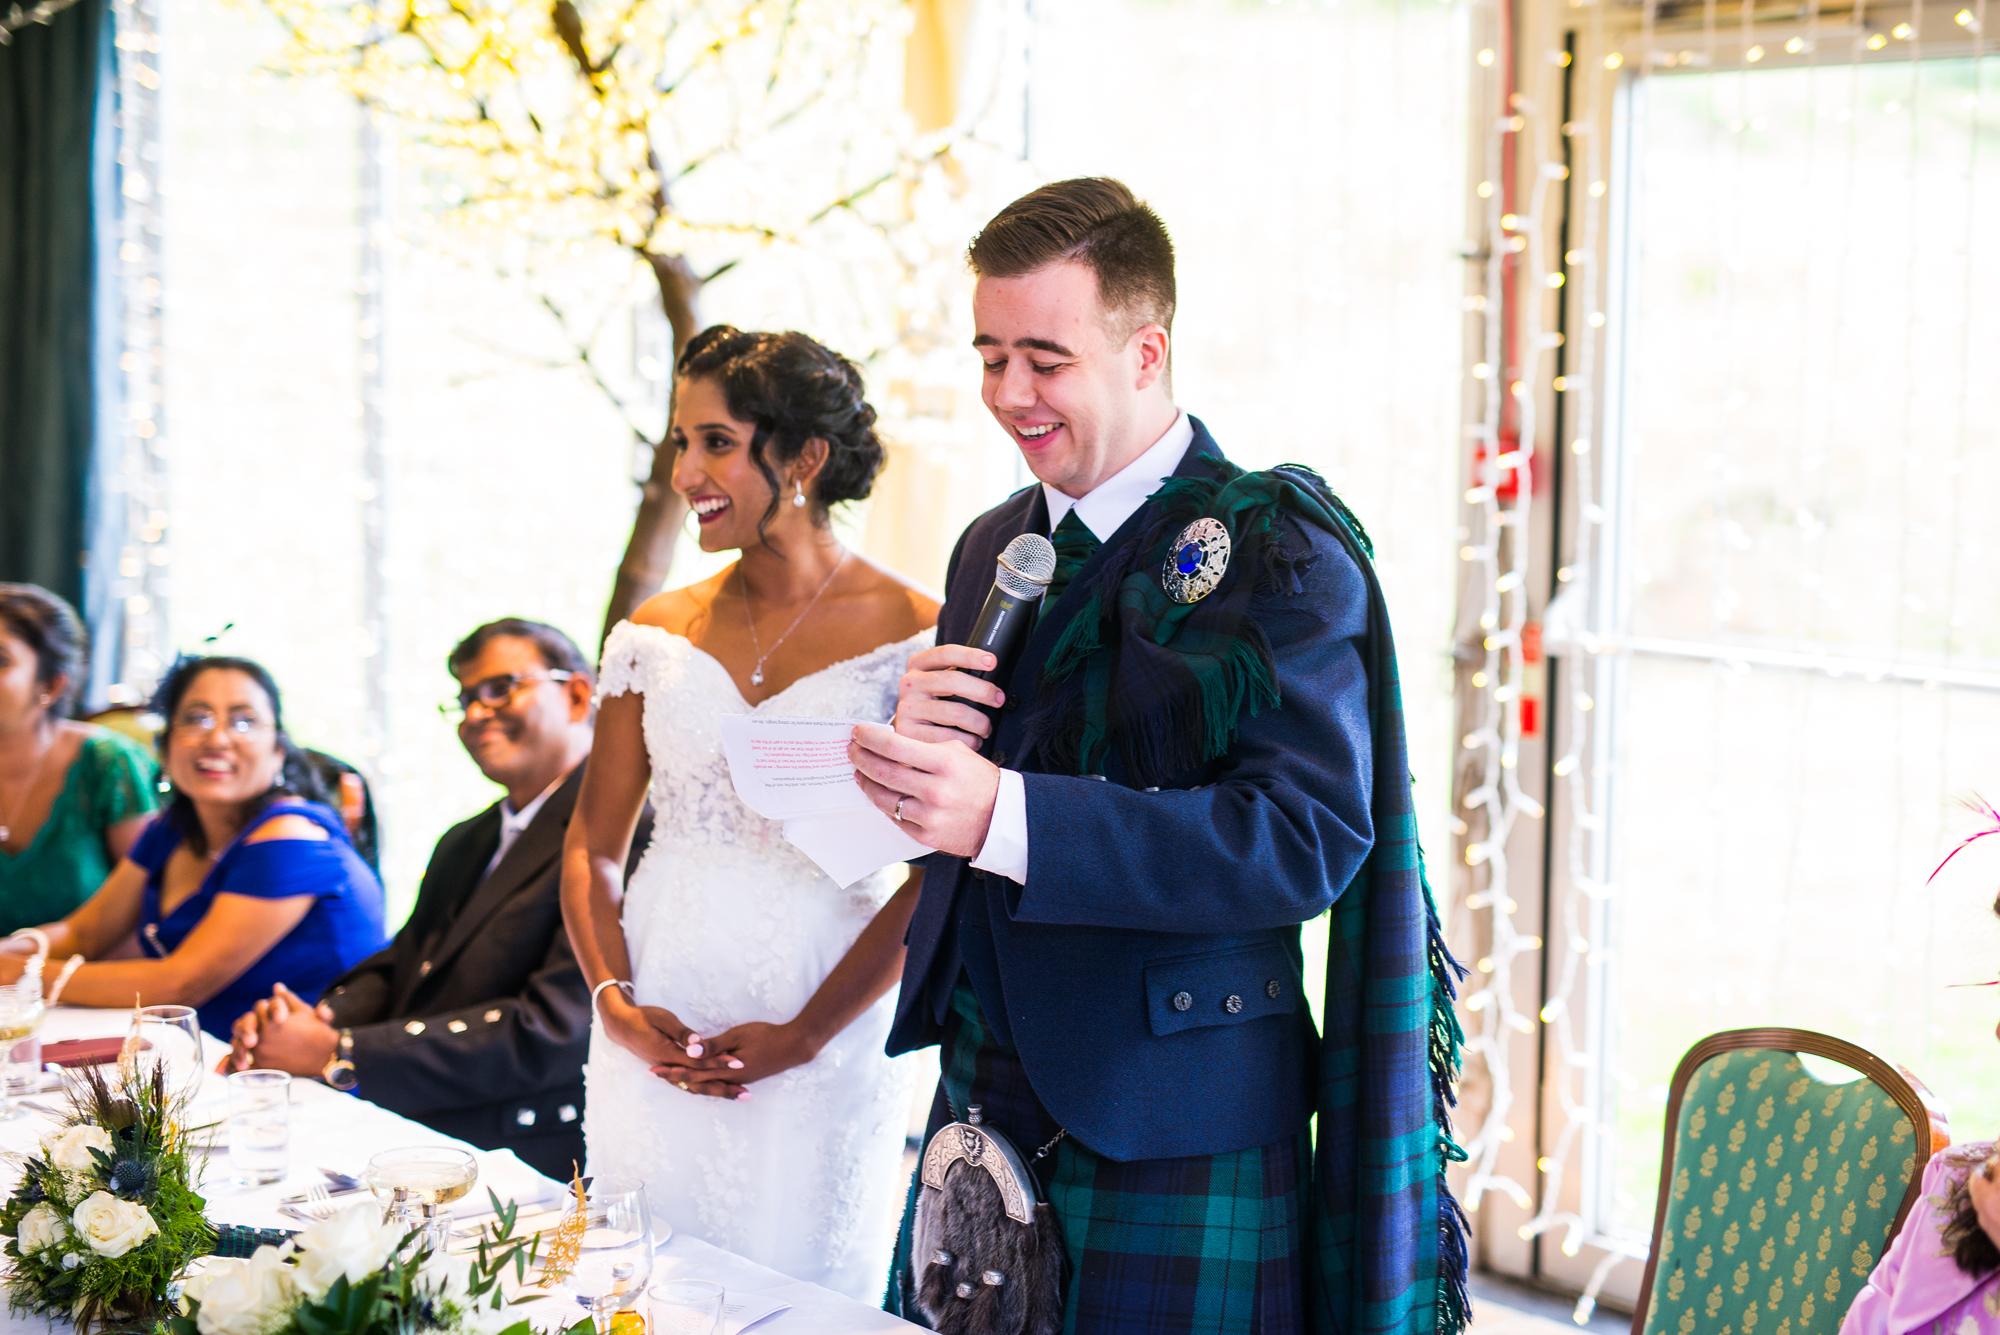 Kev and Shrabani wedding photos (254 of 350).jpg